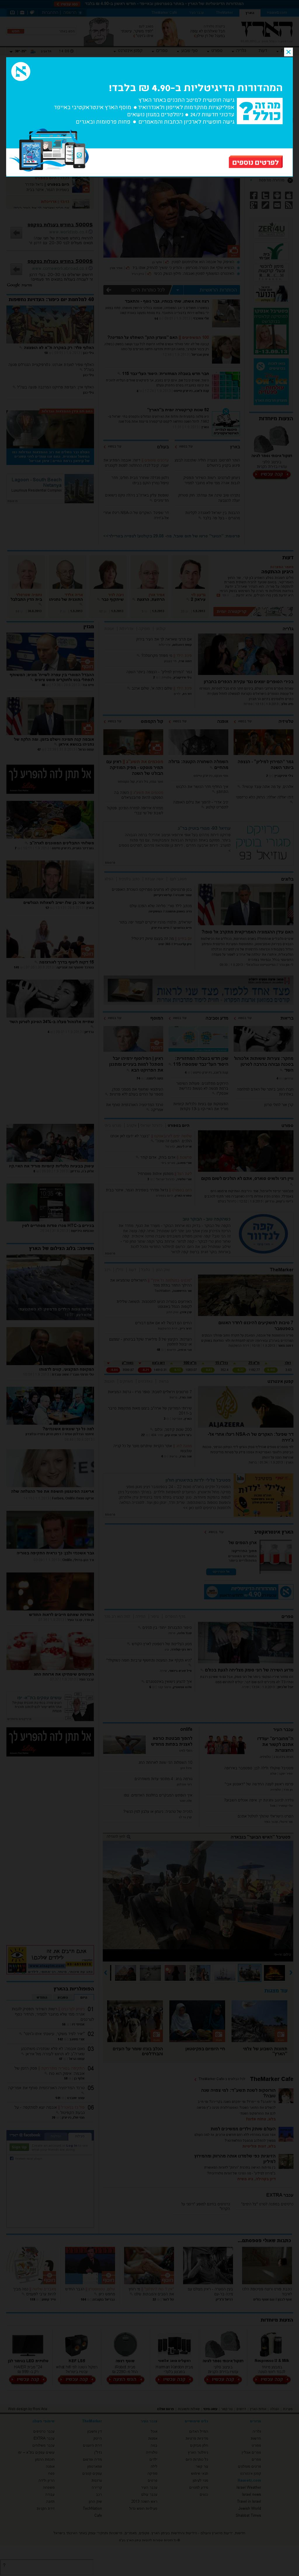 Haaretz at Sunday Sept. 1, 2013, 11:08 a.m. UTC